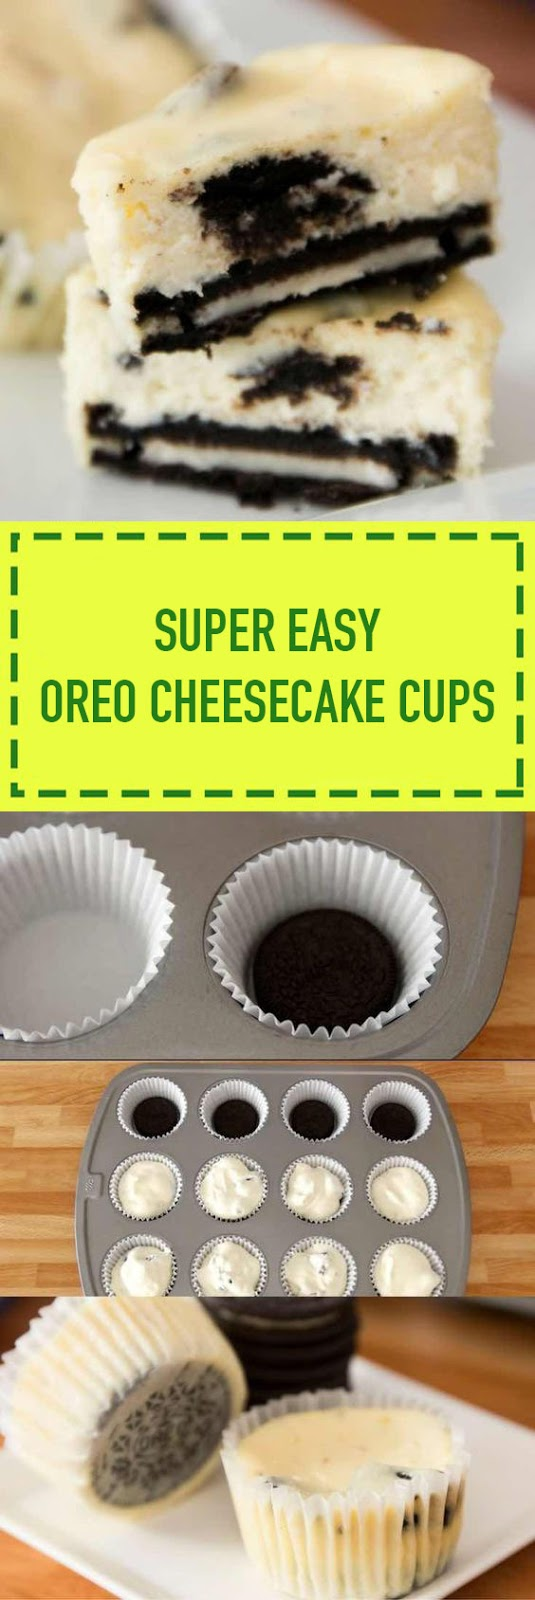 Super Easy Oreo Cheesecake Cups